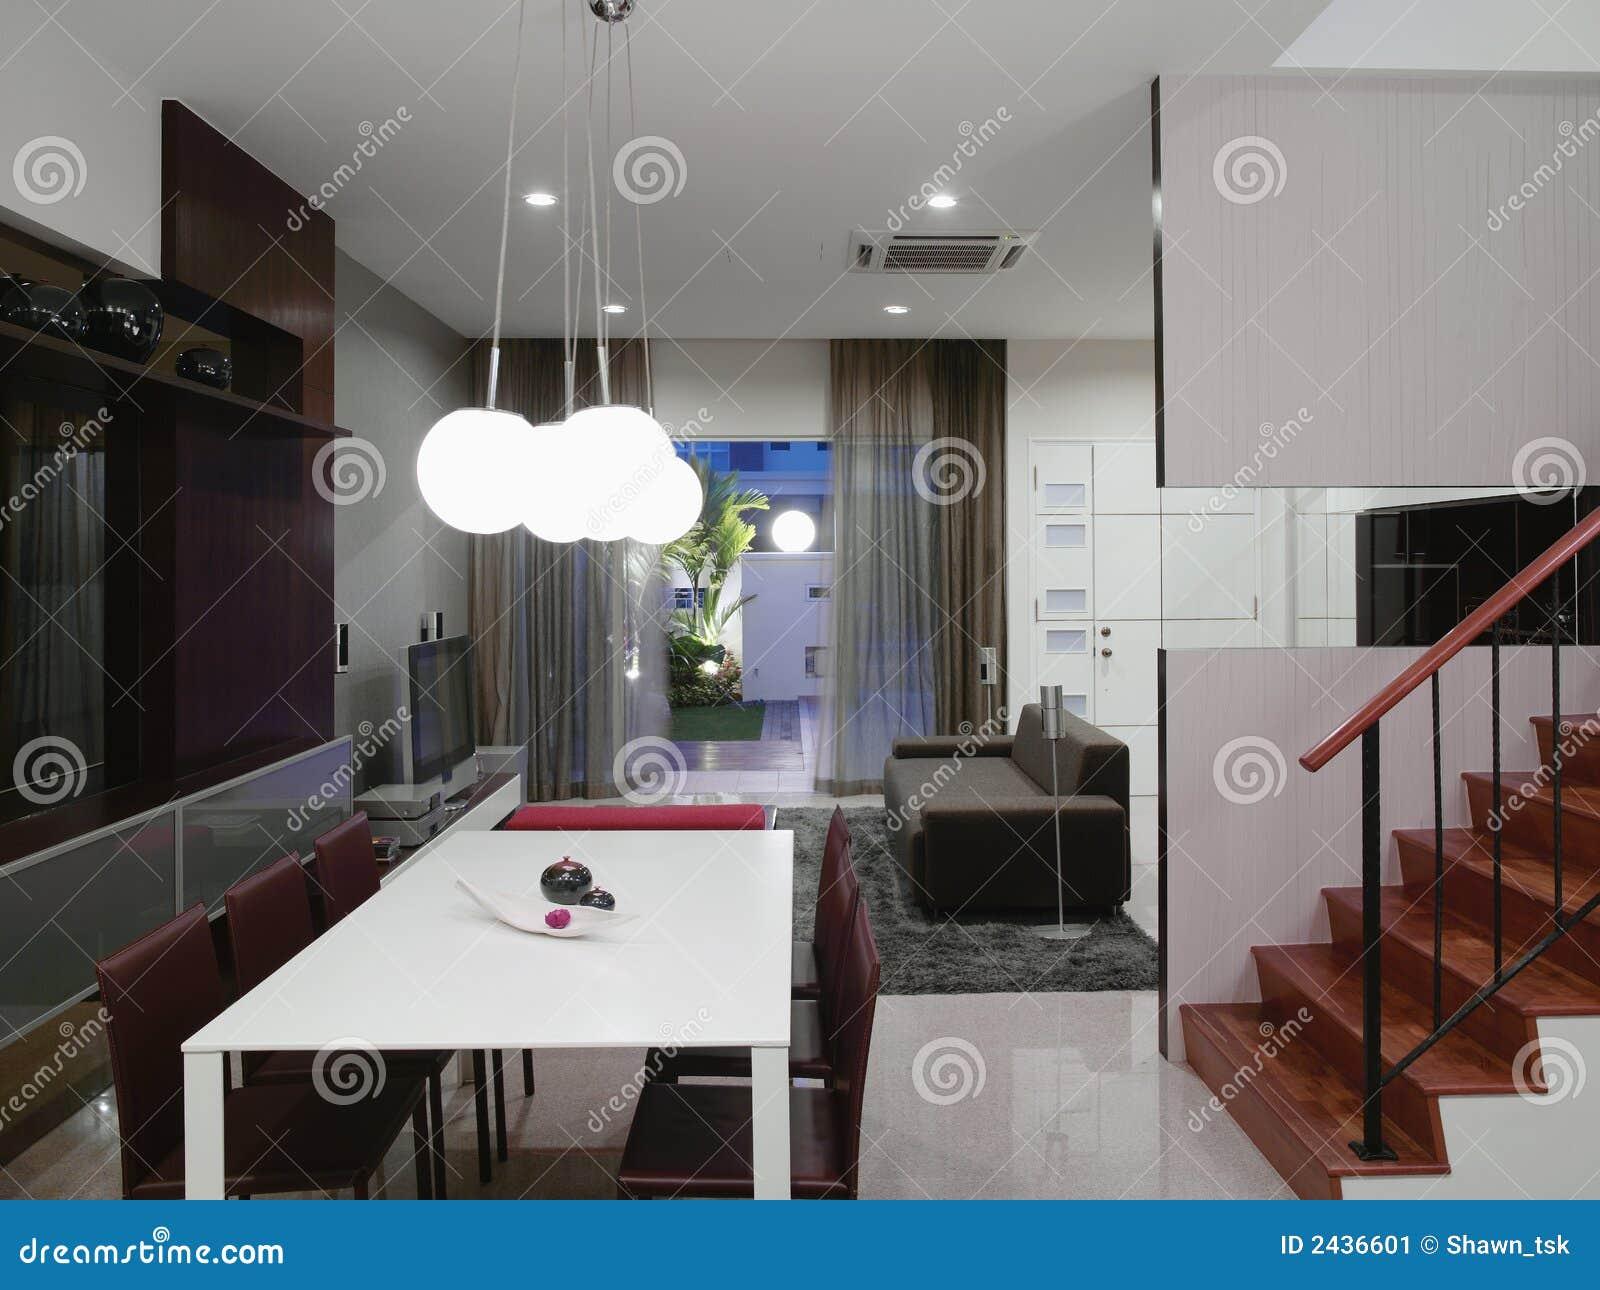 Dining Area Interior Design Seligat Wallpaper